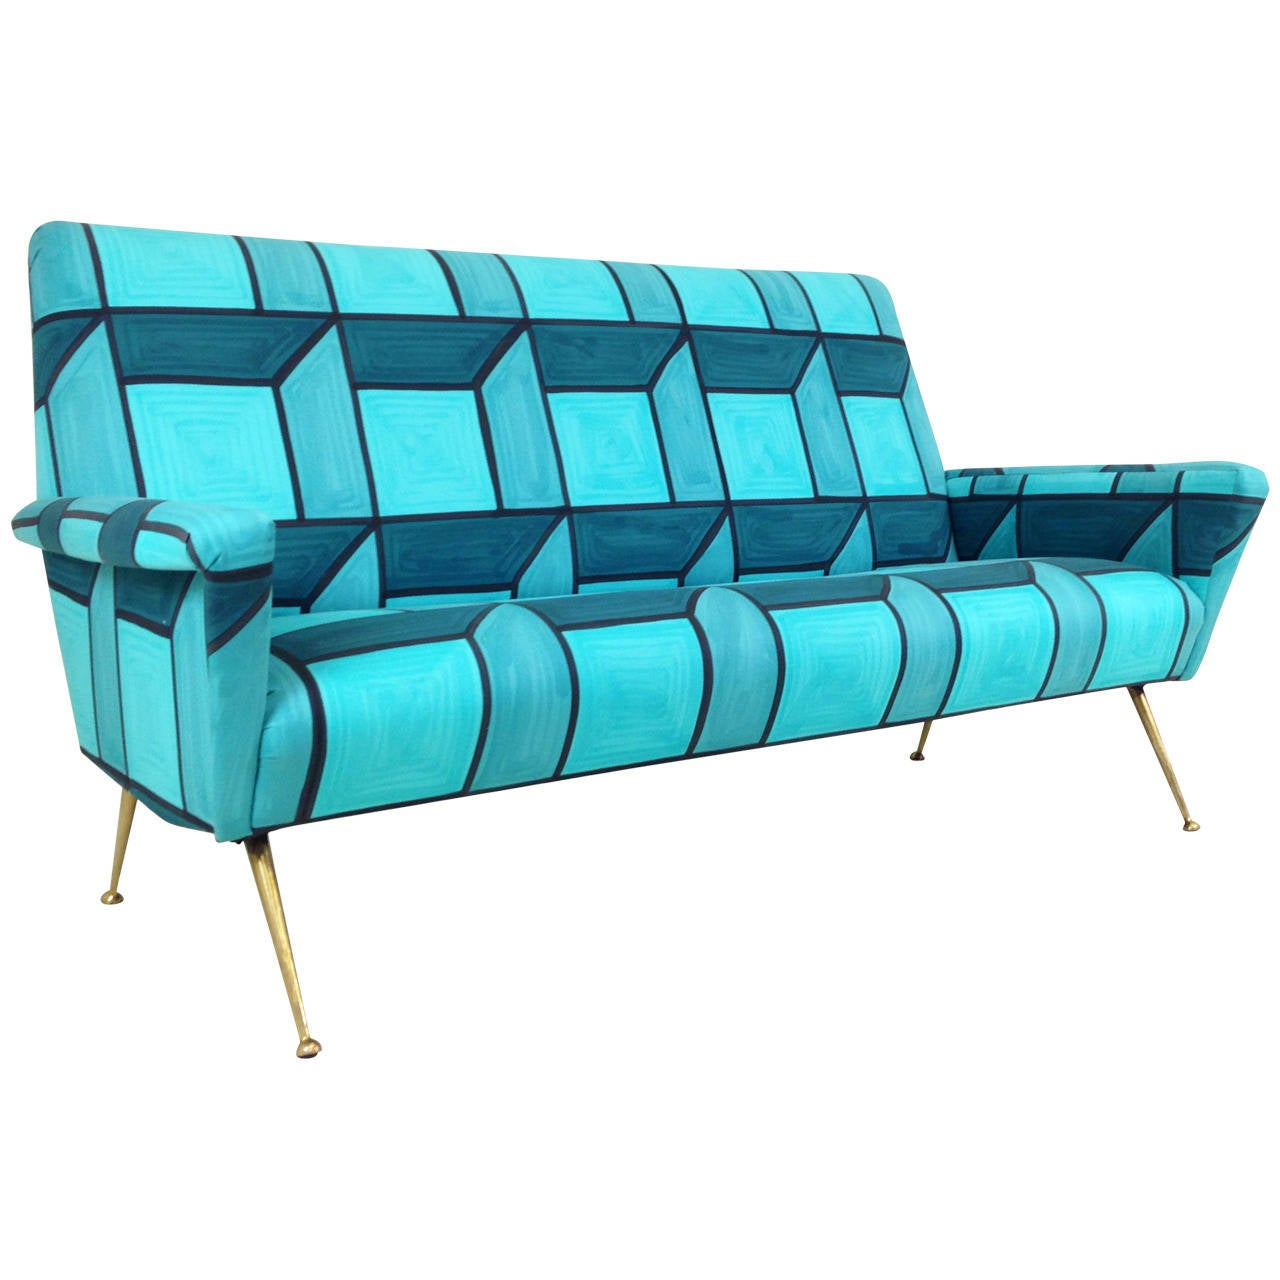 Mid-Century Sofa in Hand-Painted Blue Cube Pattern Livio de Simone Fabric 1